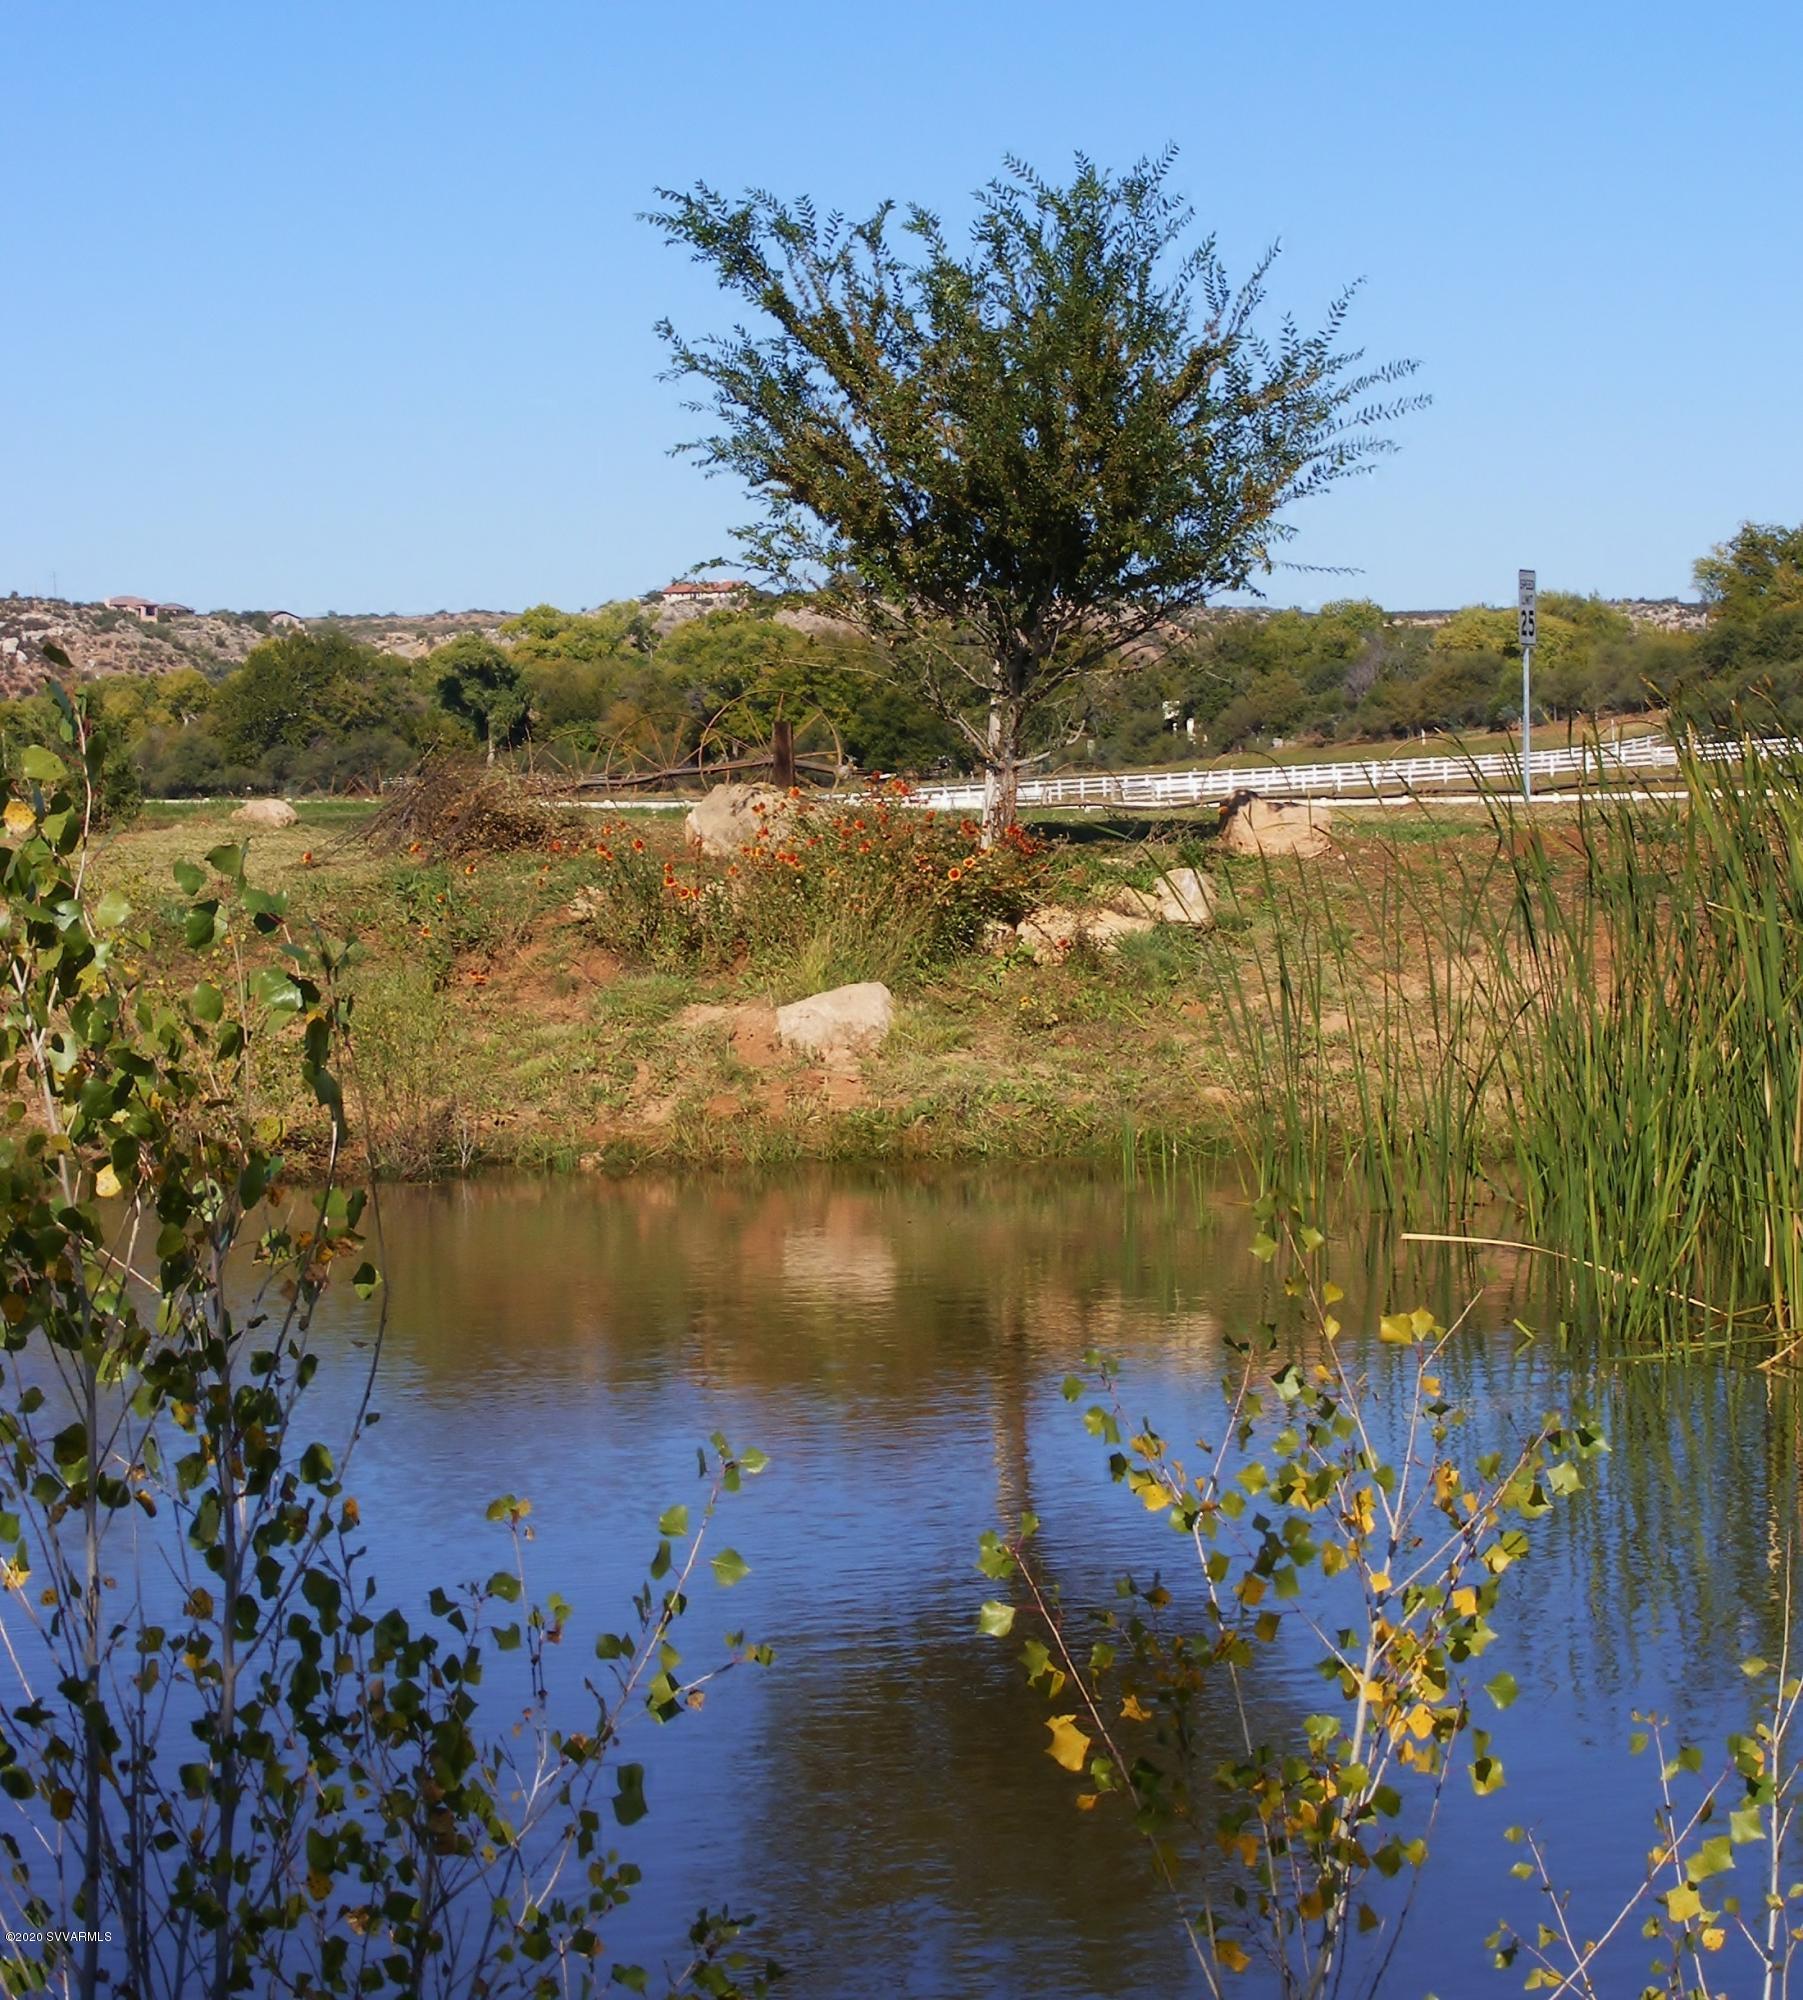 275 S Bonito Ranch Loop Cornville, AZ 86325